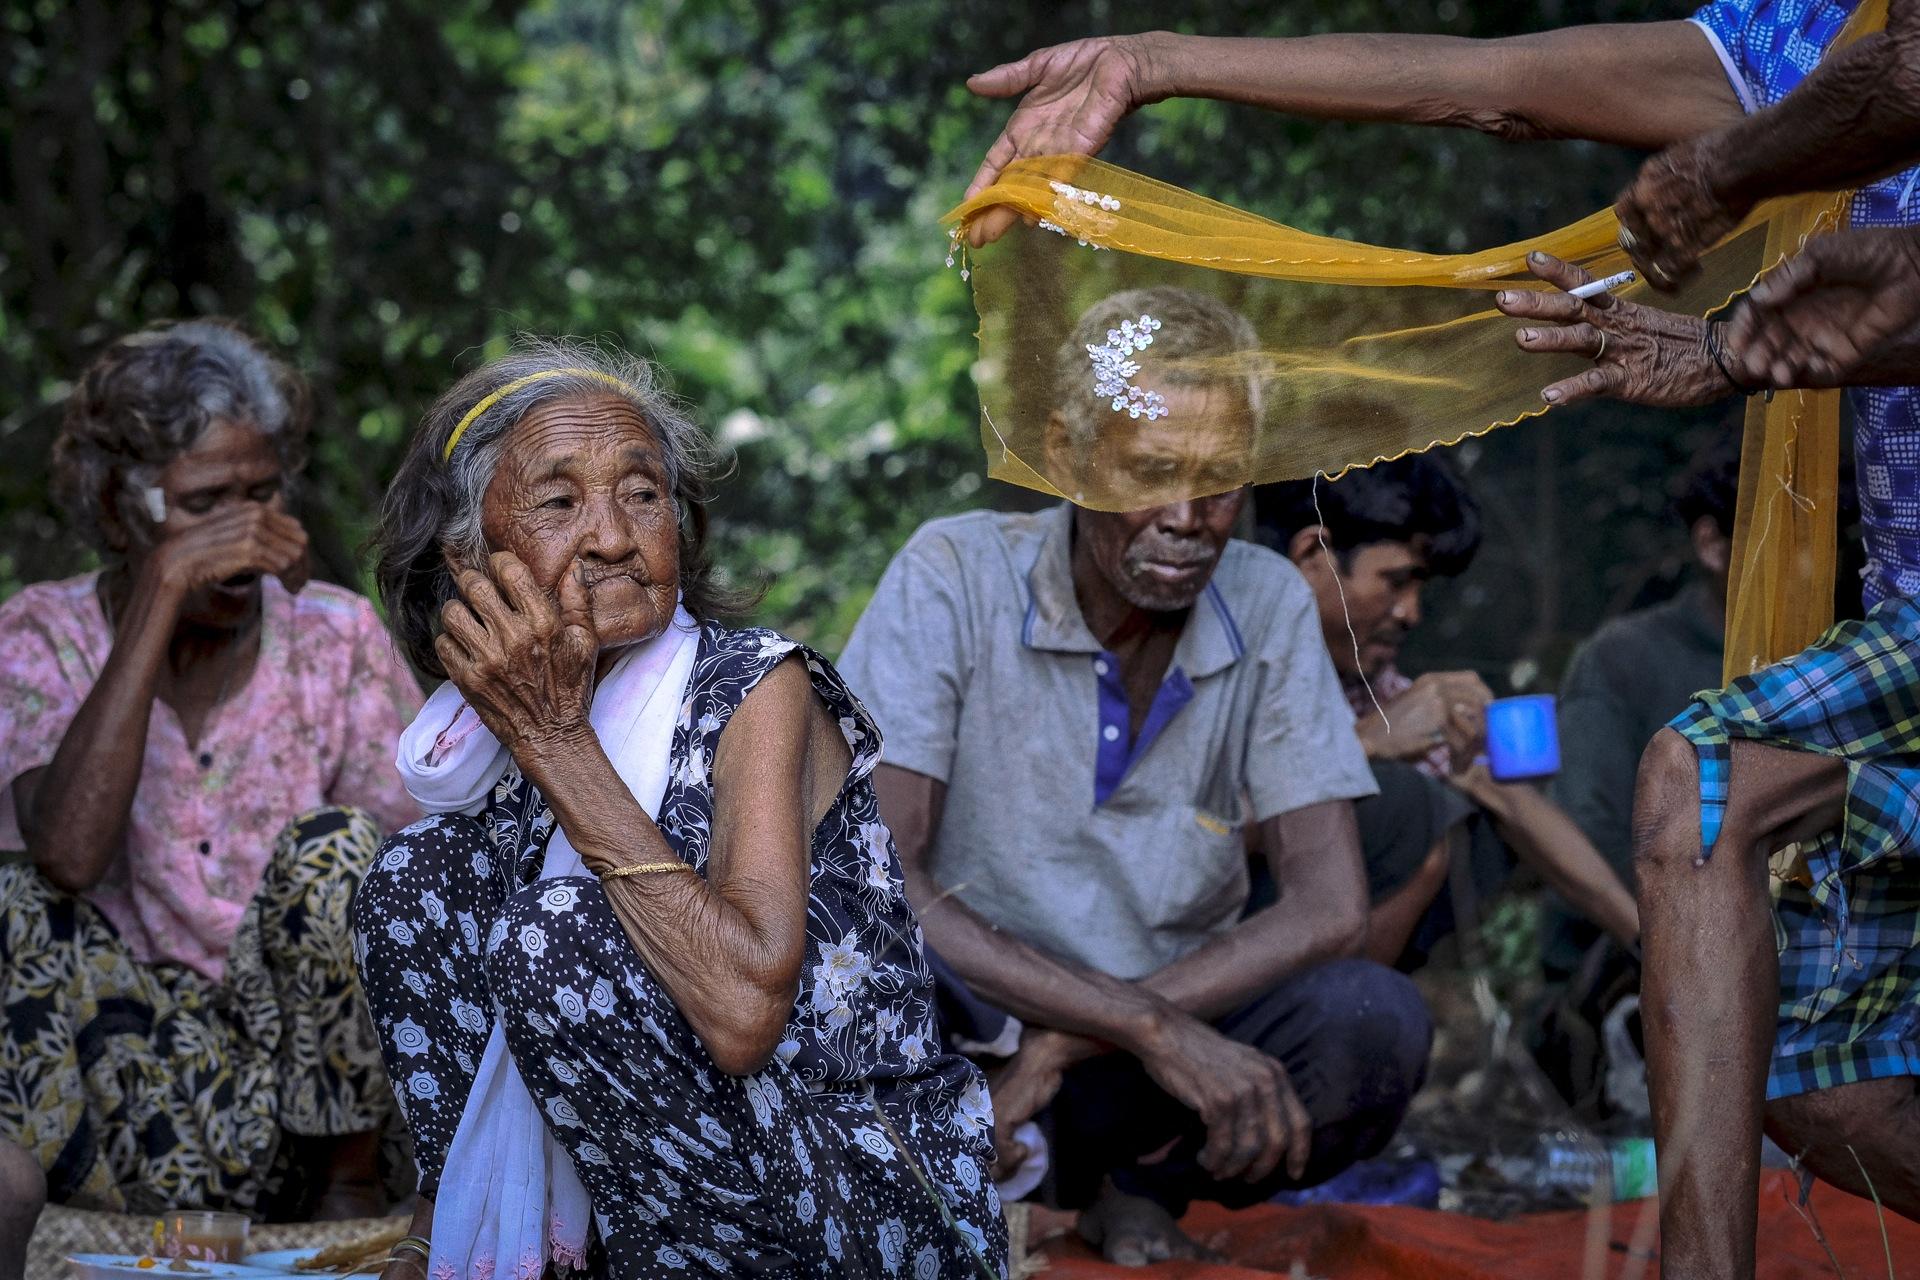 shamanic ceremonies